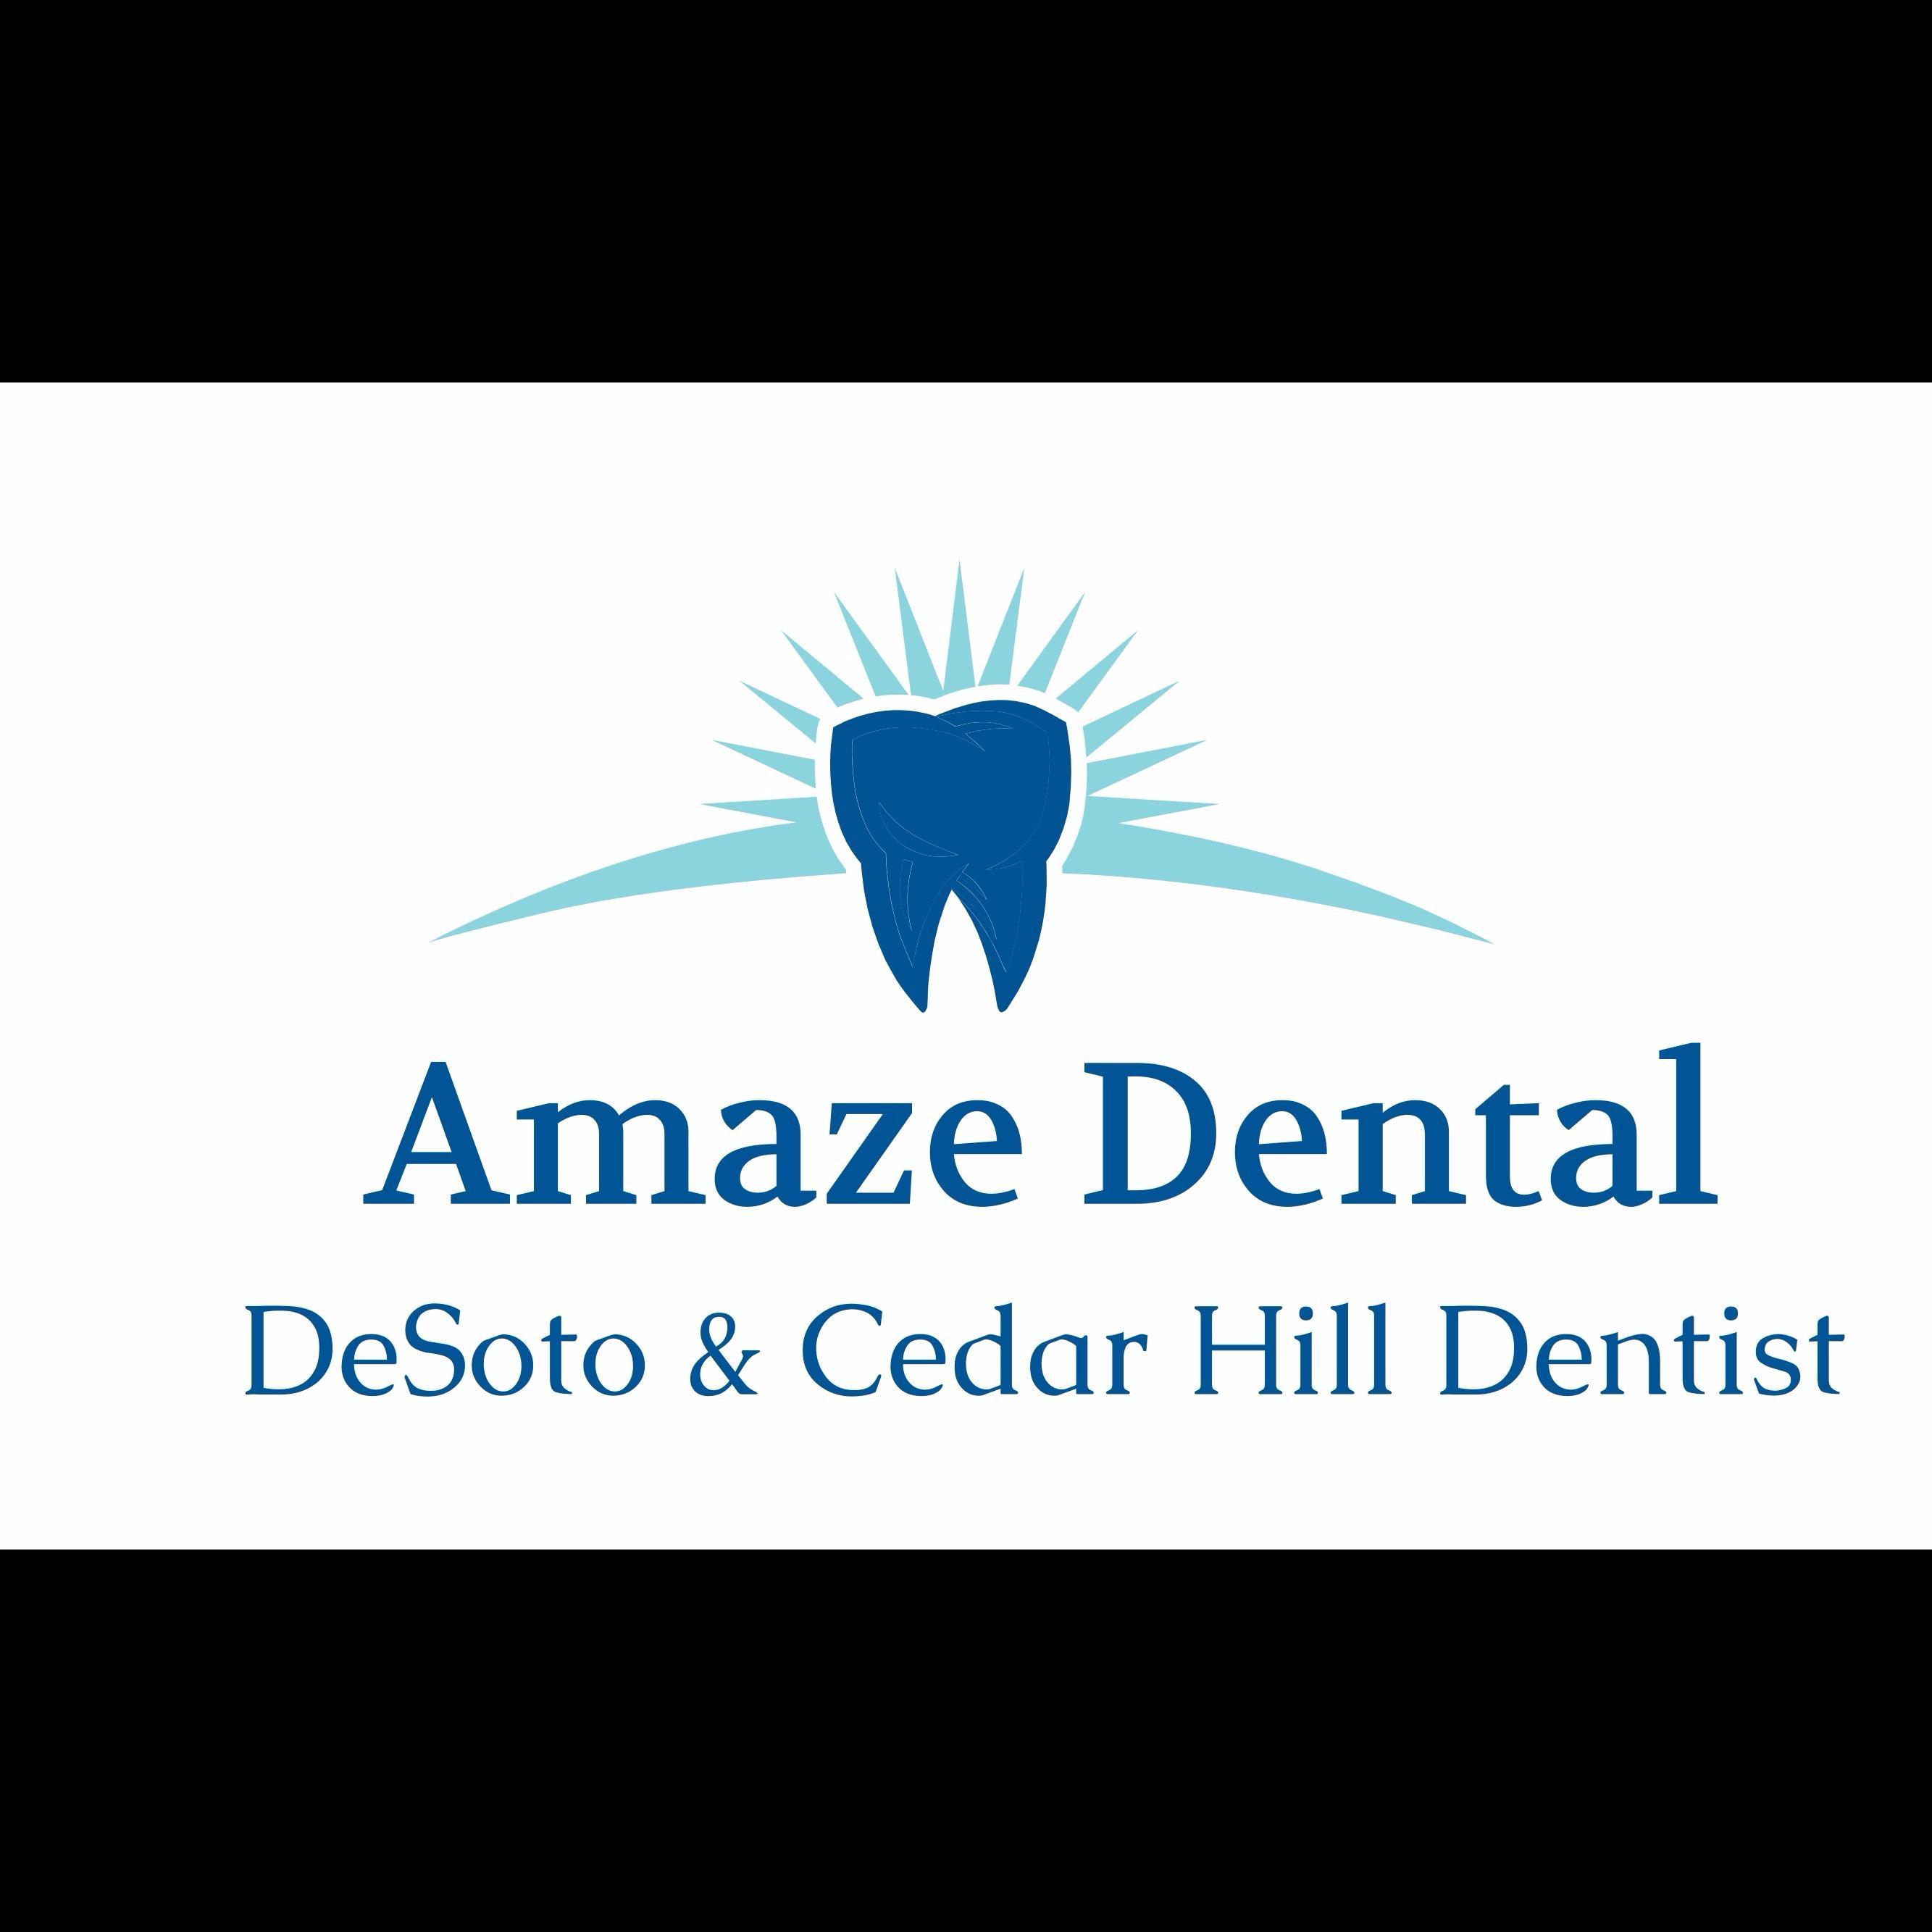 Amaze Dental- DeSoto & Cedar Hill Dentist